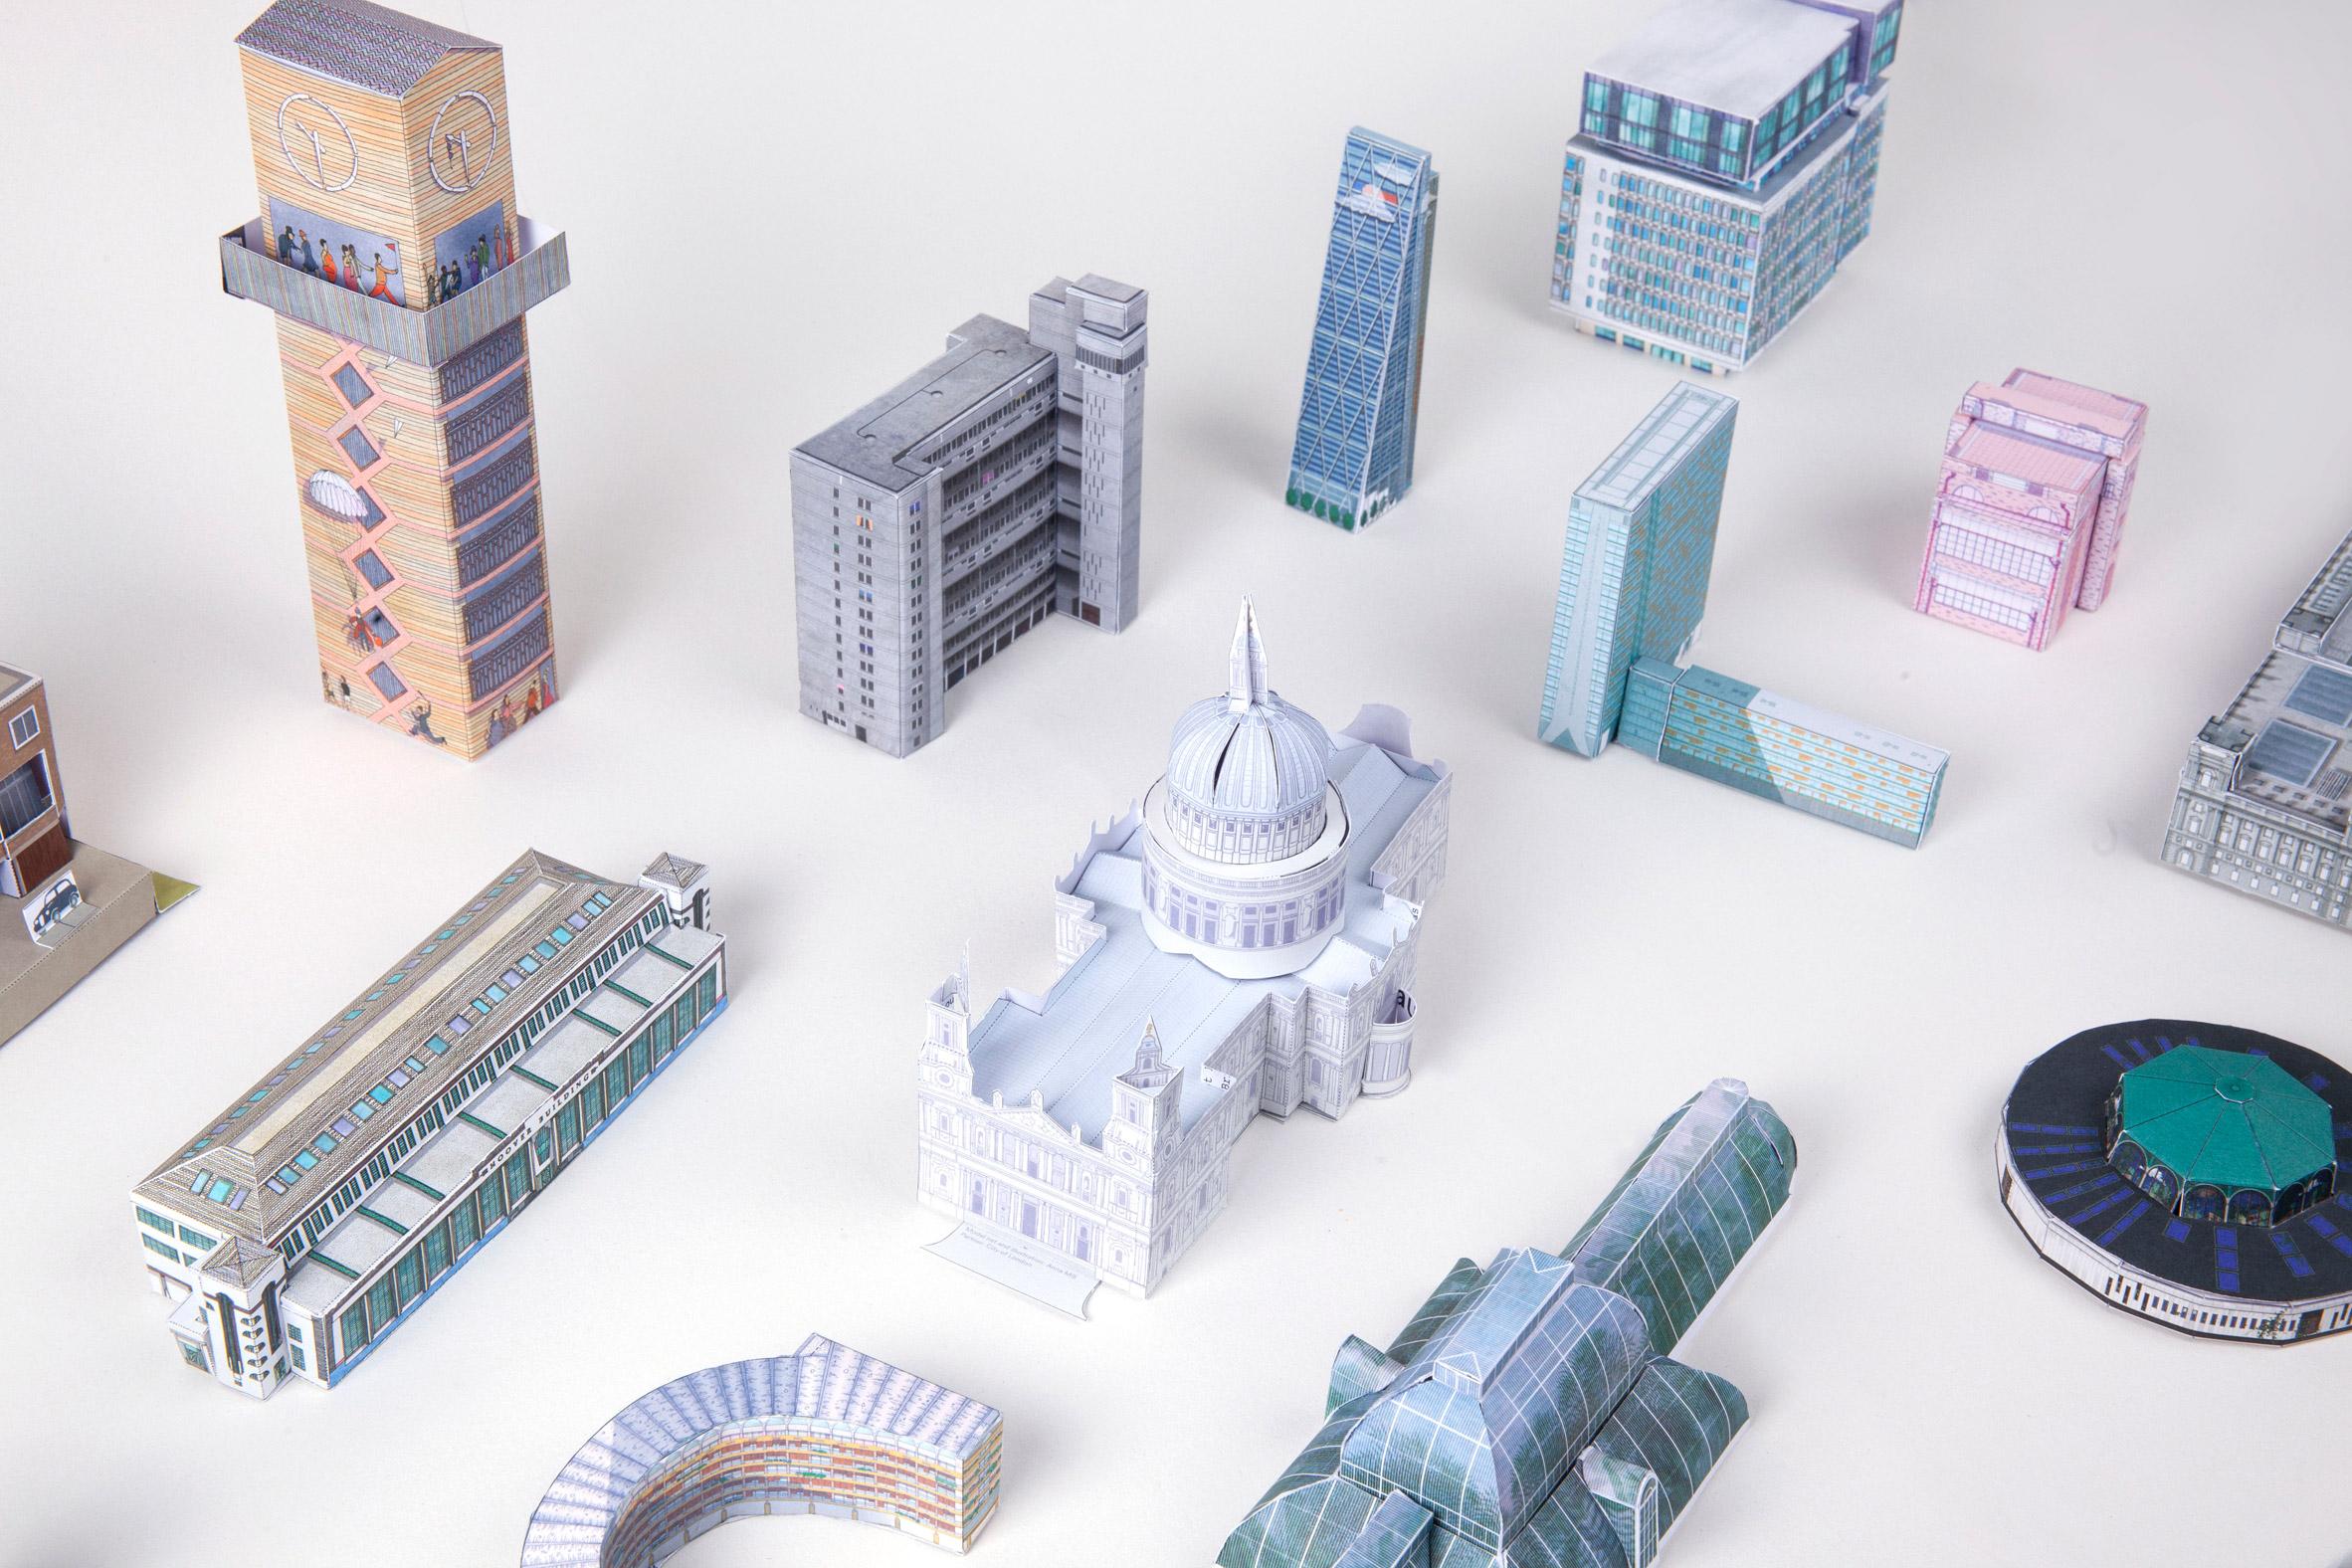 Open House London's building model activity packs